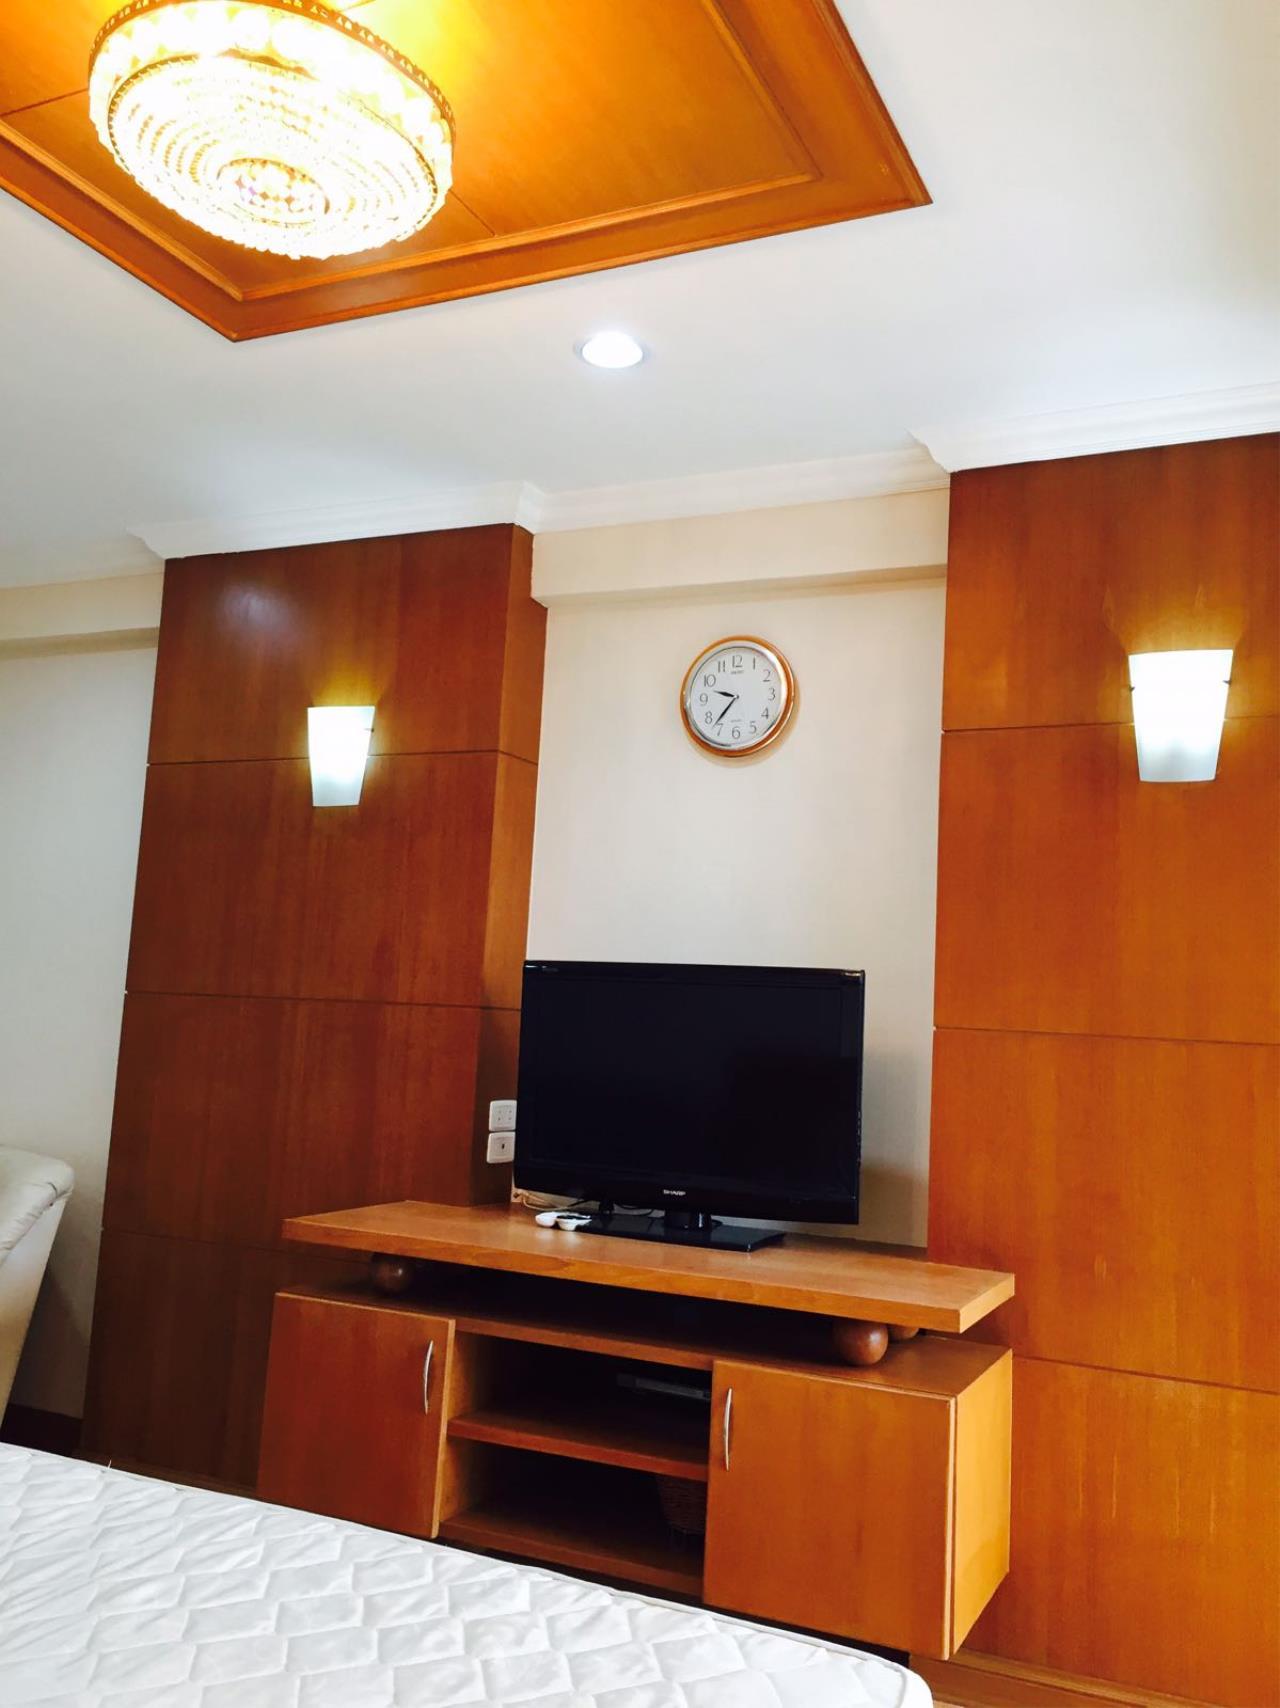 Immobilien Pattaya Agency's Jomtien Beach Condo S2, 32 Sqm. Studio, Sea View, Foreigner Quota 7